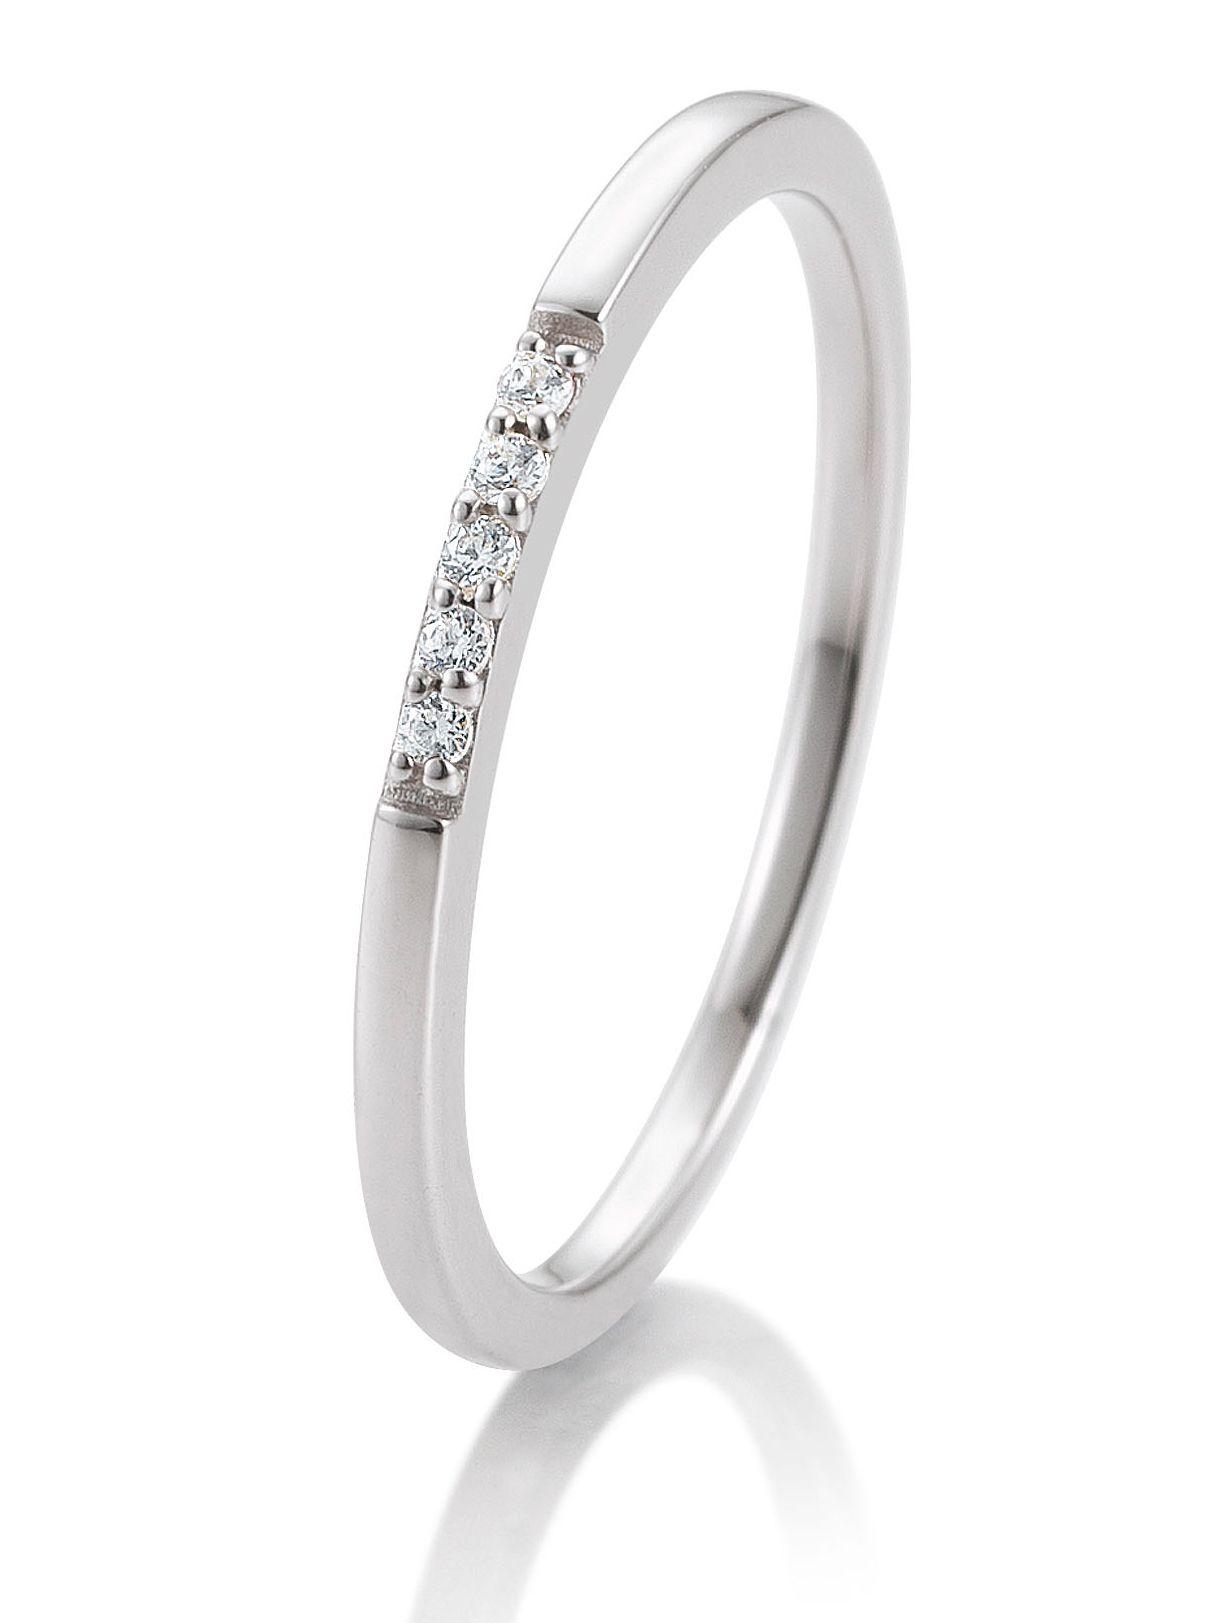 Verlobungsring Weissgold 0 038 Ct Memoire Ring Gem Gem Engagement